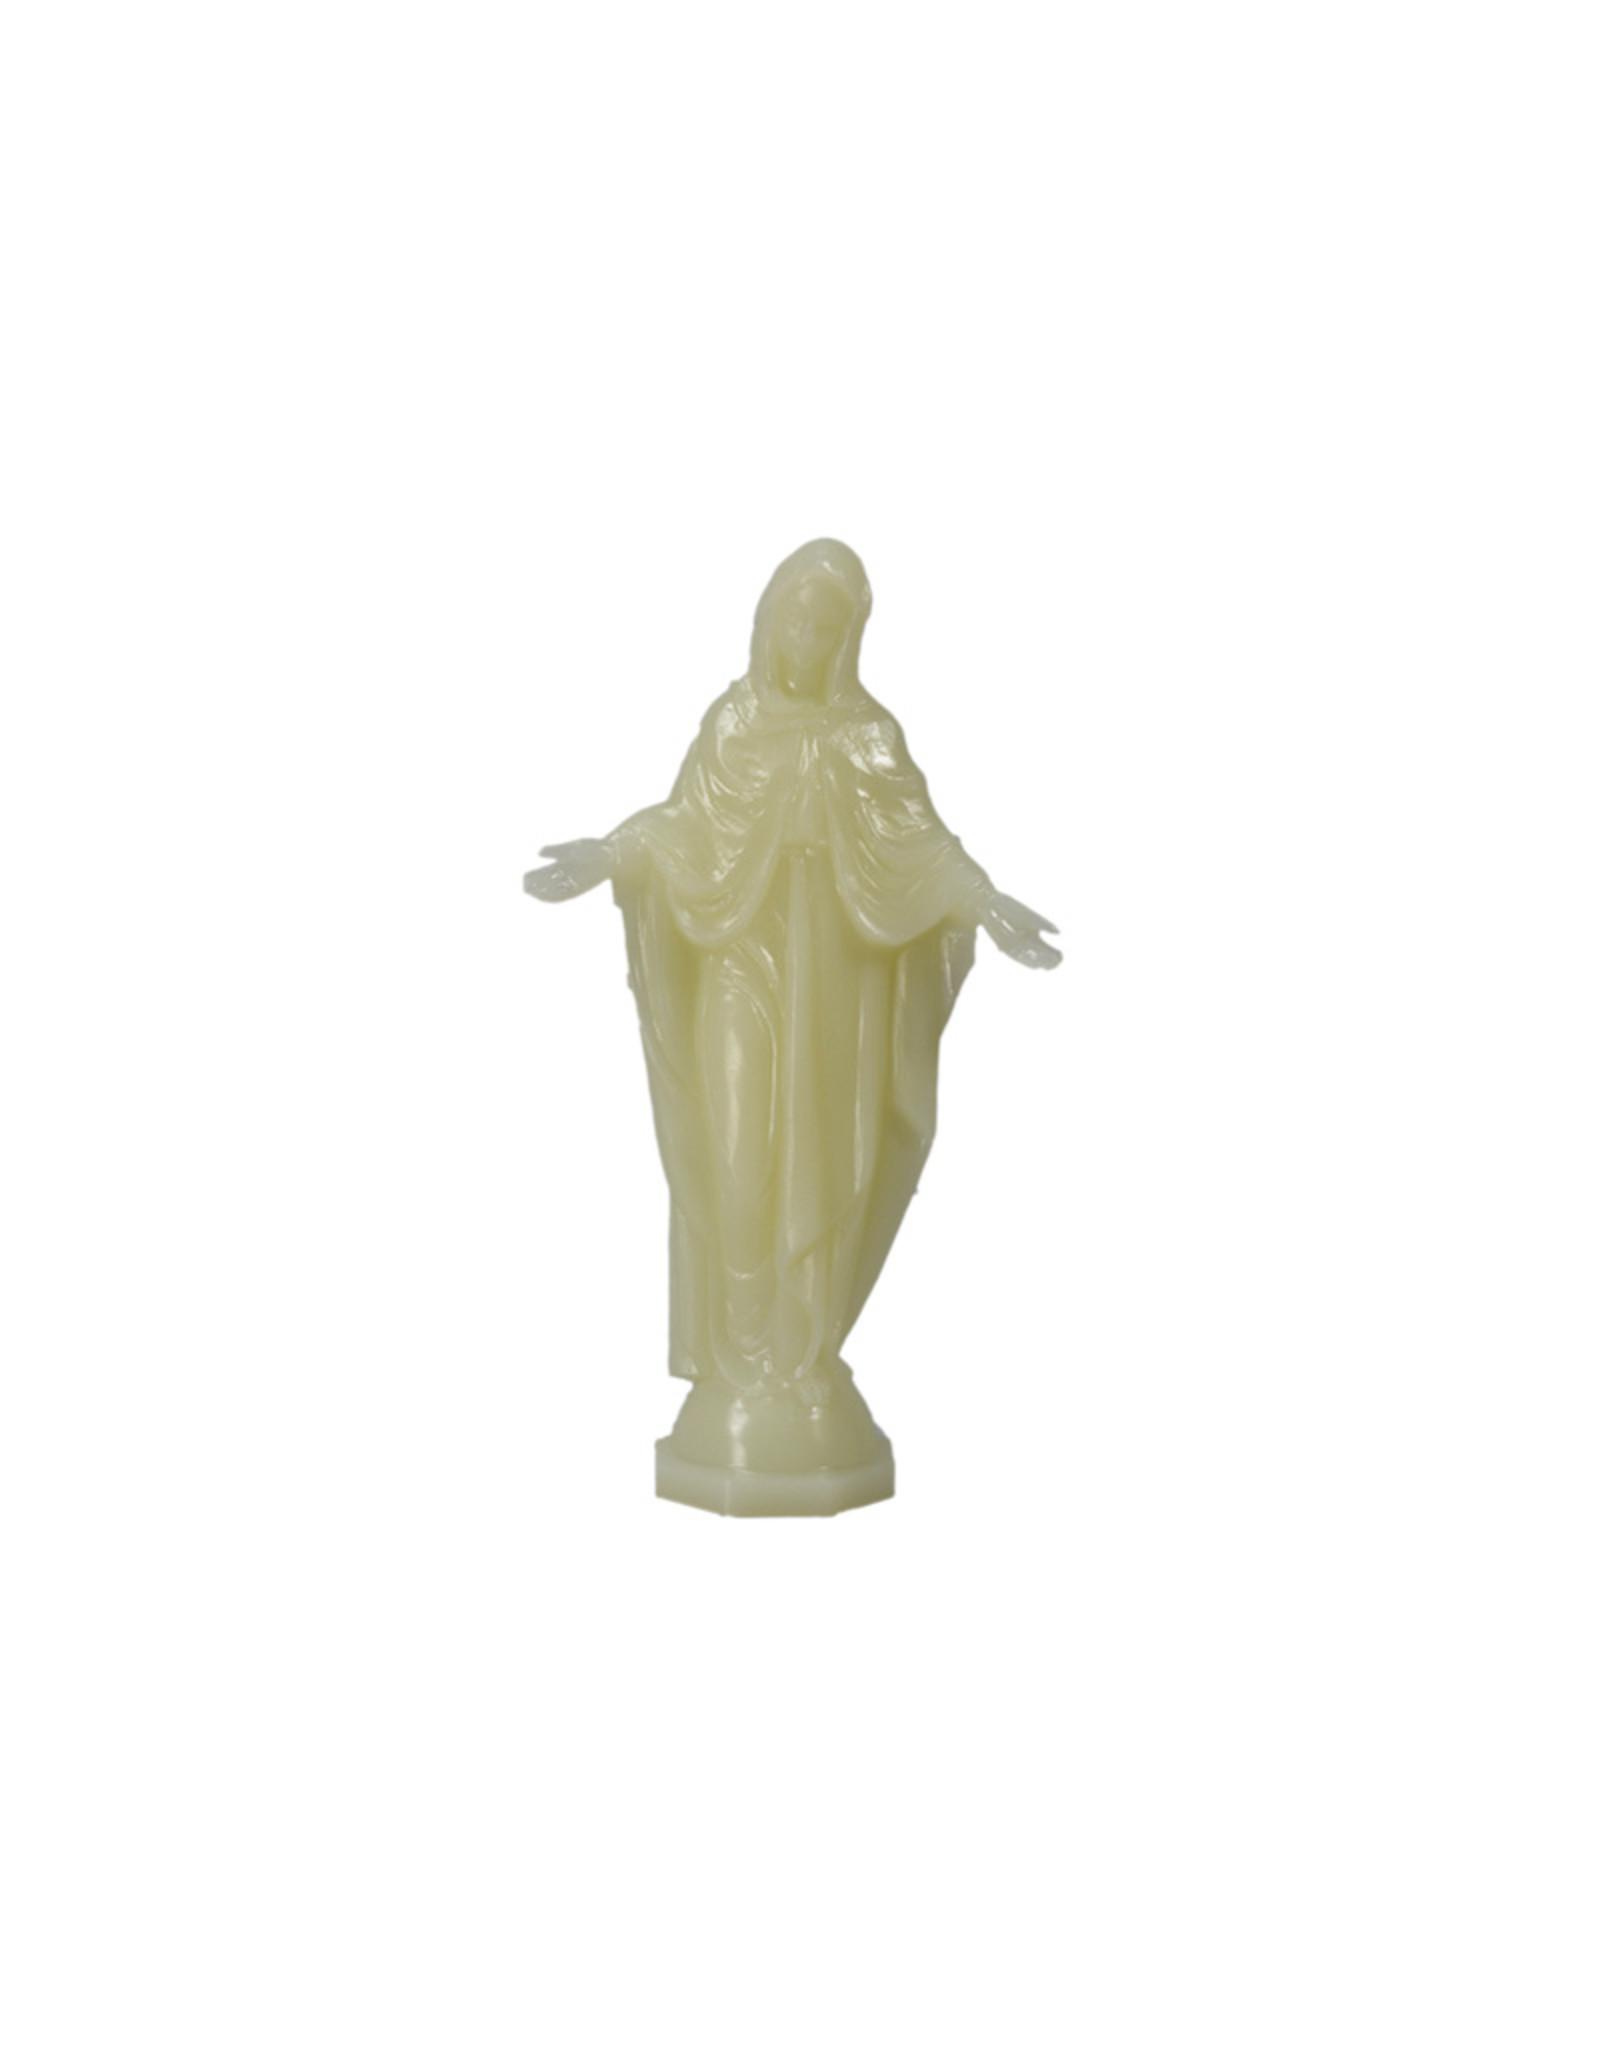 Phosphorescent Virgin Mary statue (15.5cm)